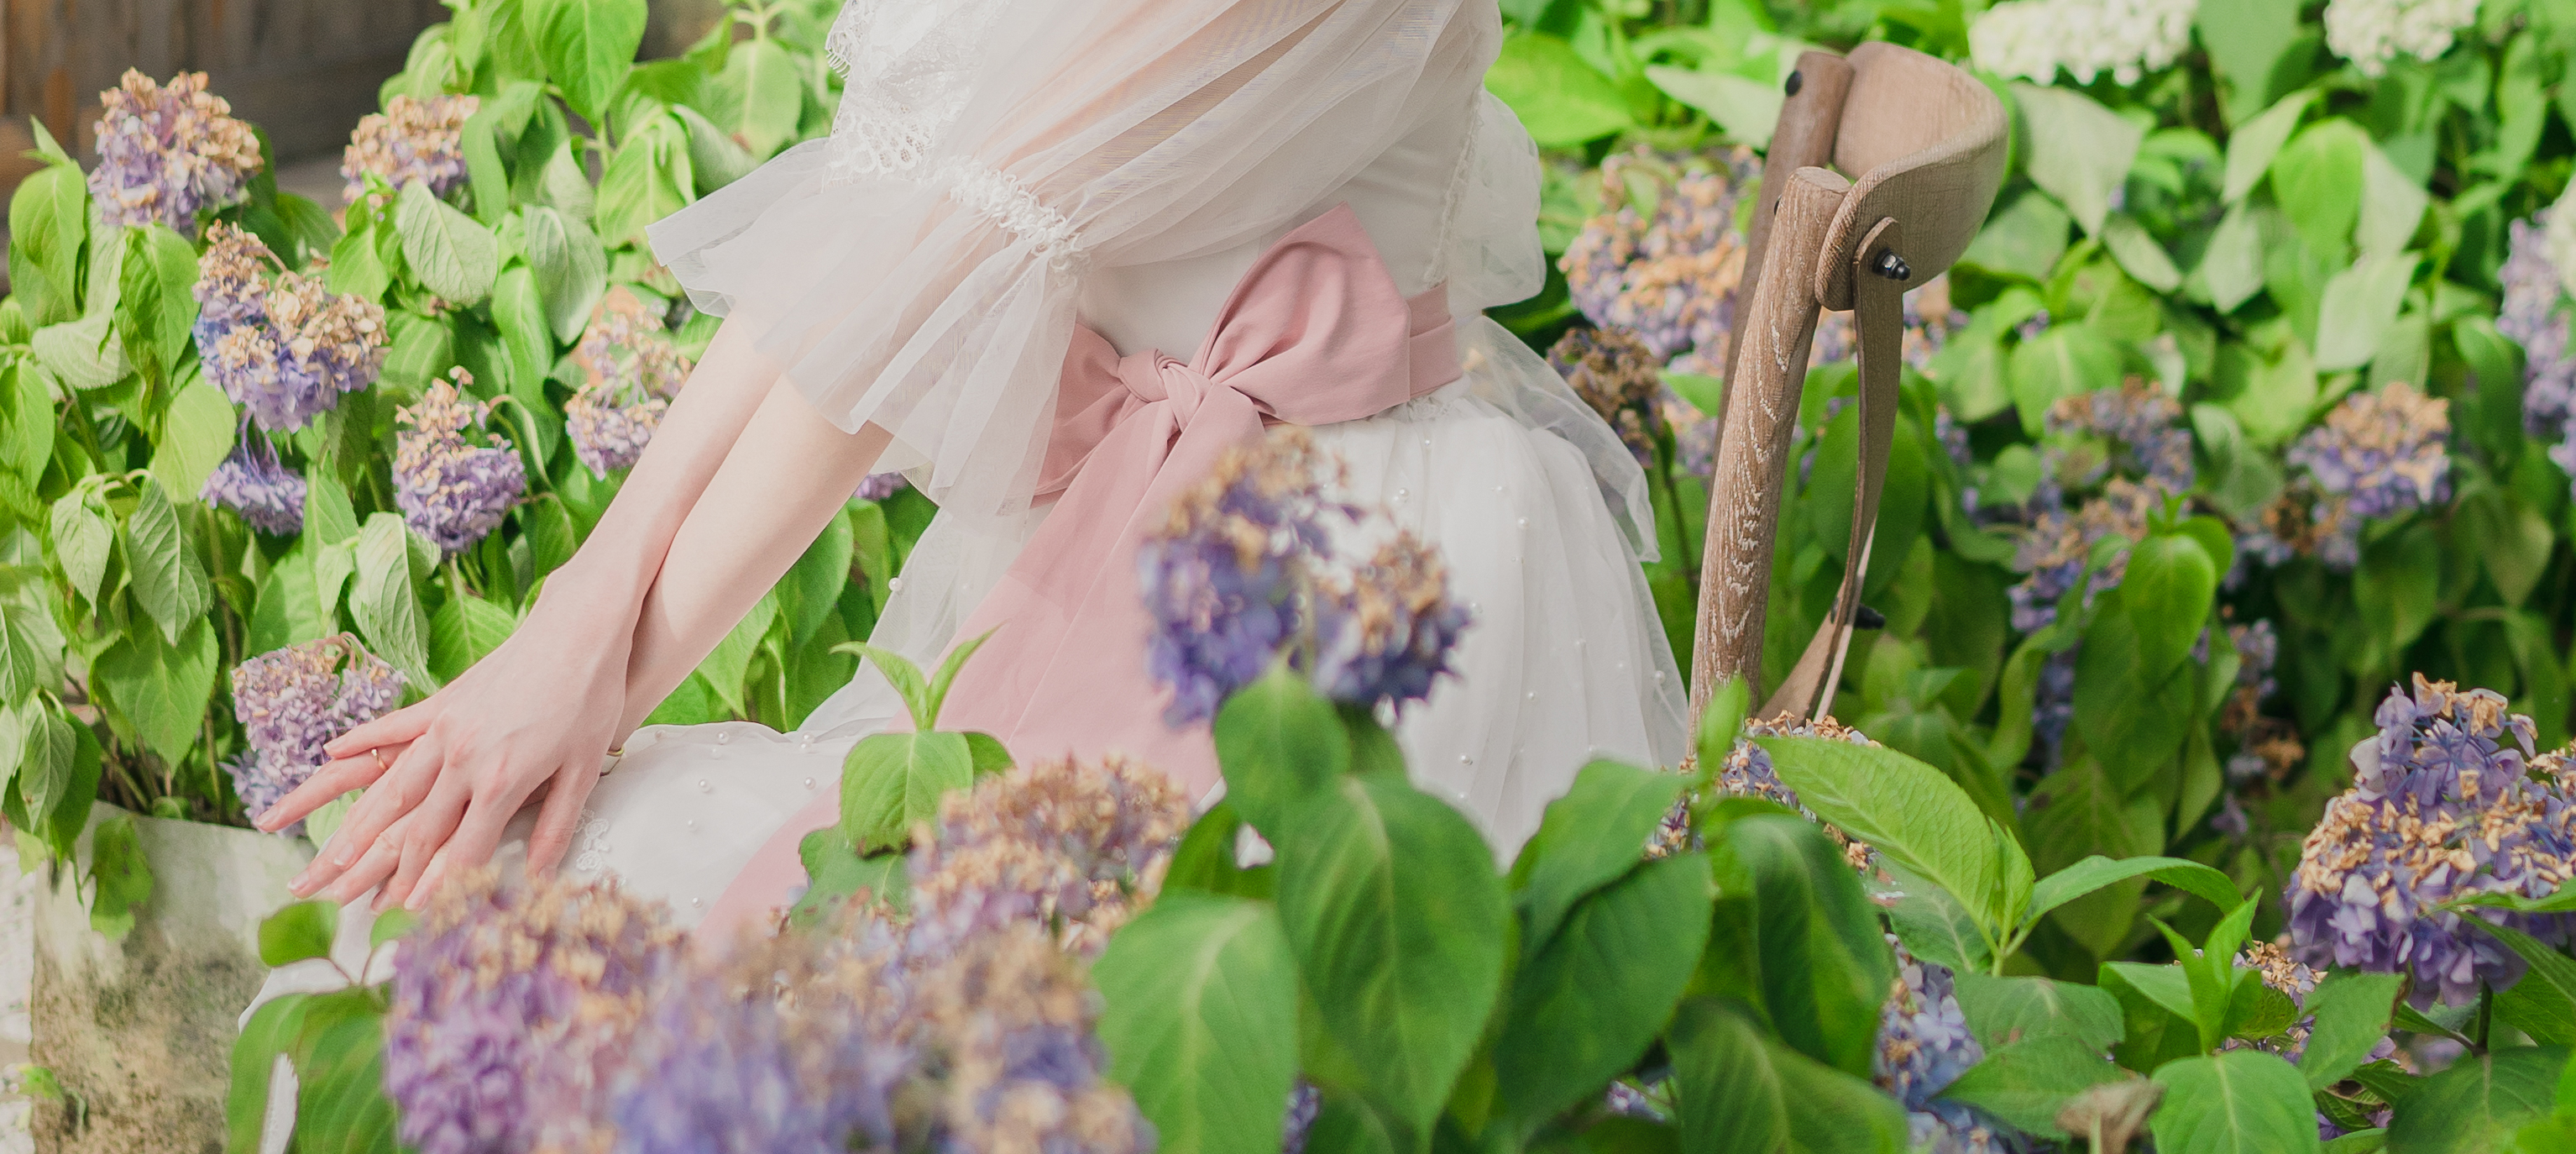 Lolita摄影思路分享|给小姐姐和她的小裙子一套清新夏日look